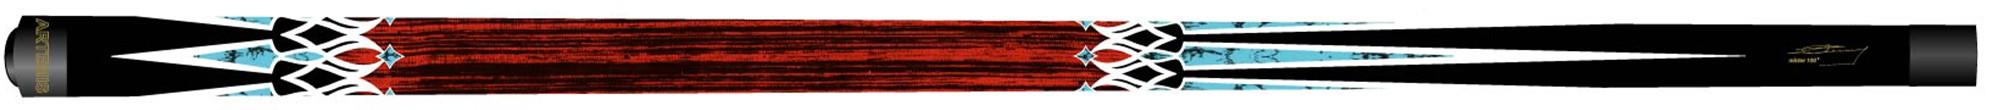 Artemis keu Mister 100 model redwood 4 punts blauw